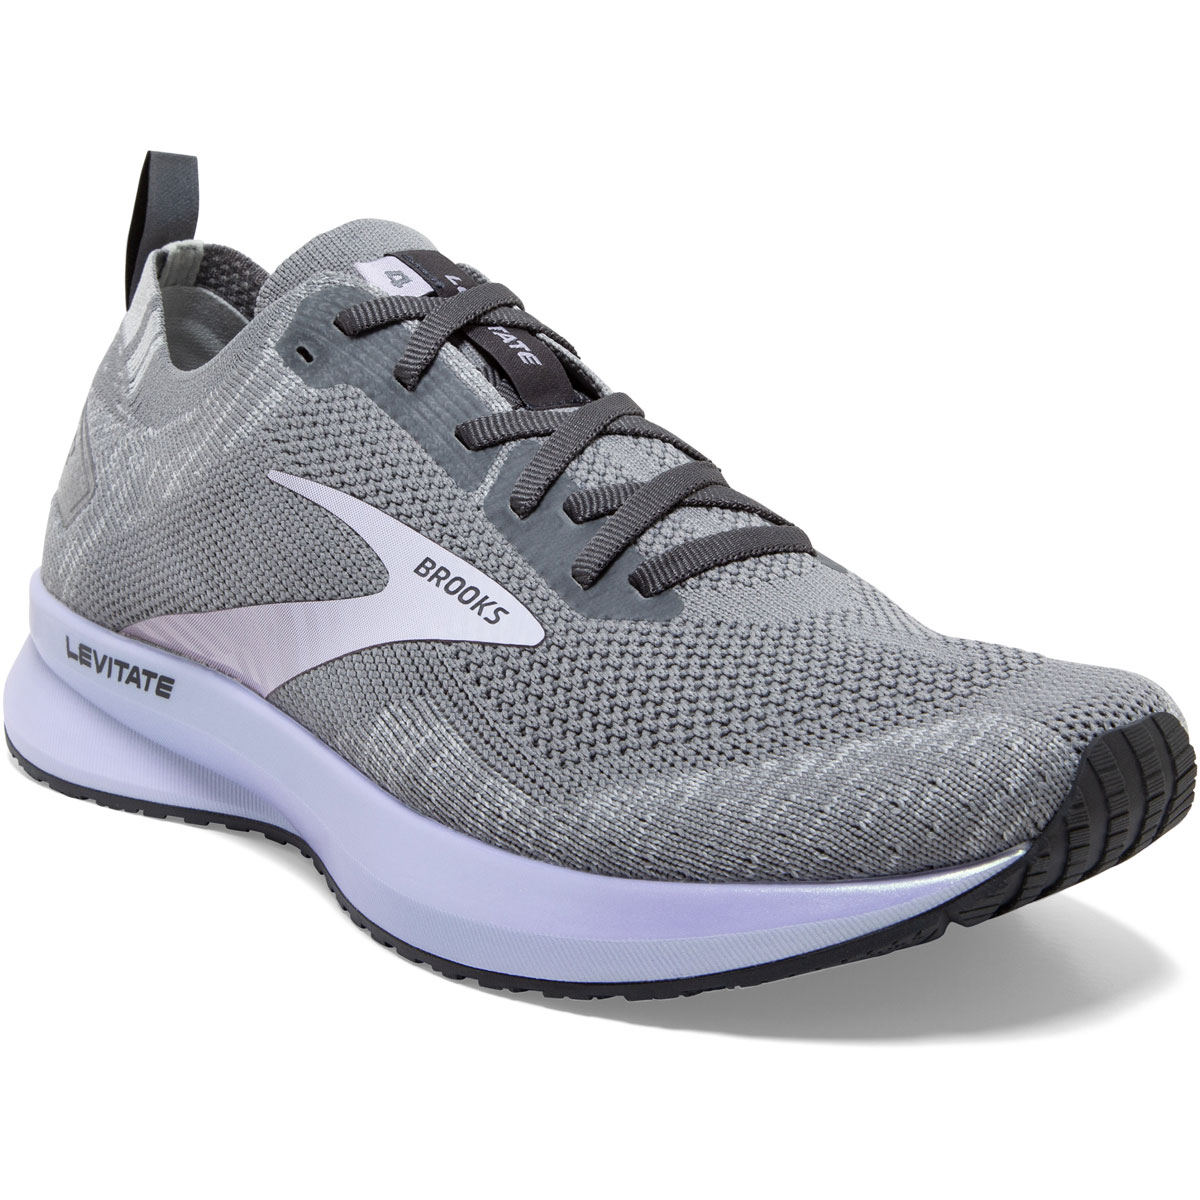 Women's Brooks Levitate 4 Running Shoe - Color: Grey/Blackened Pearl/Purple - Size: 5 - Width: Regular, Grey/Blackened Pearl/Purple, large, image 2